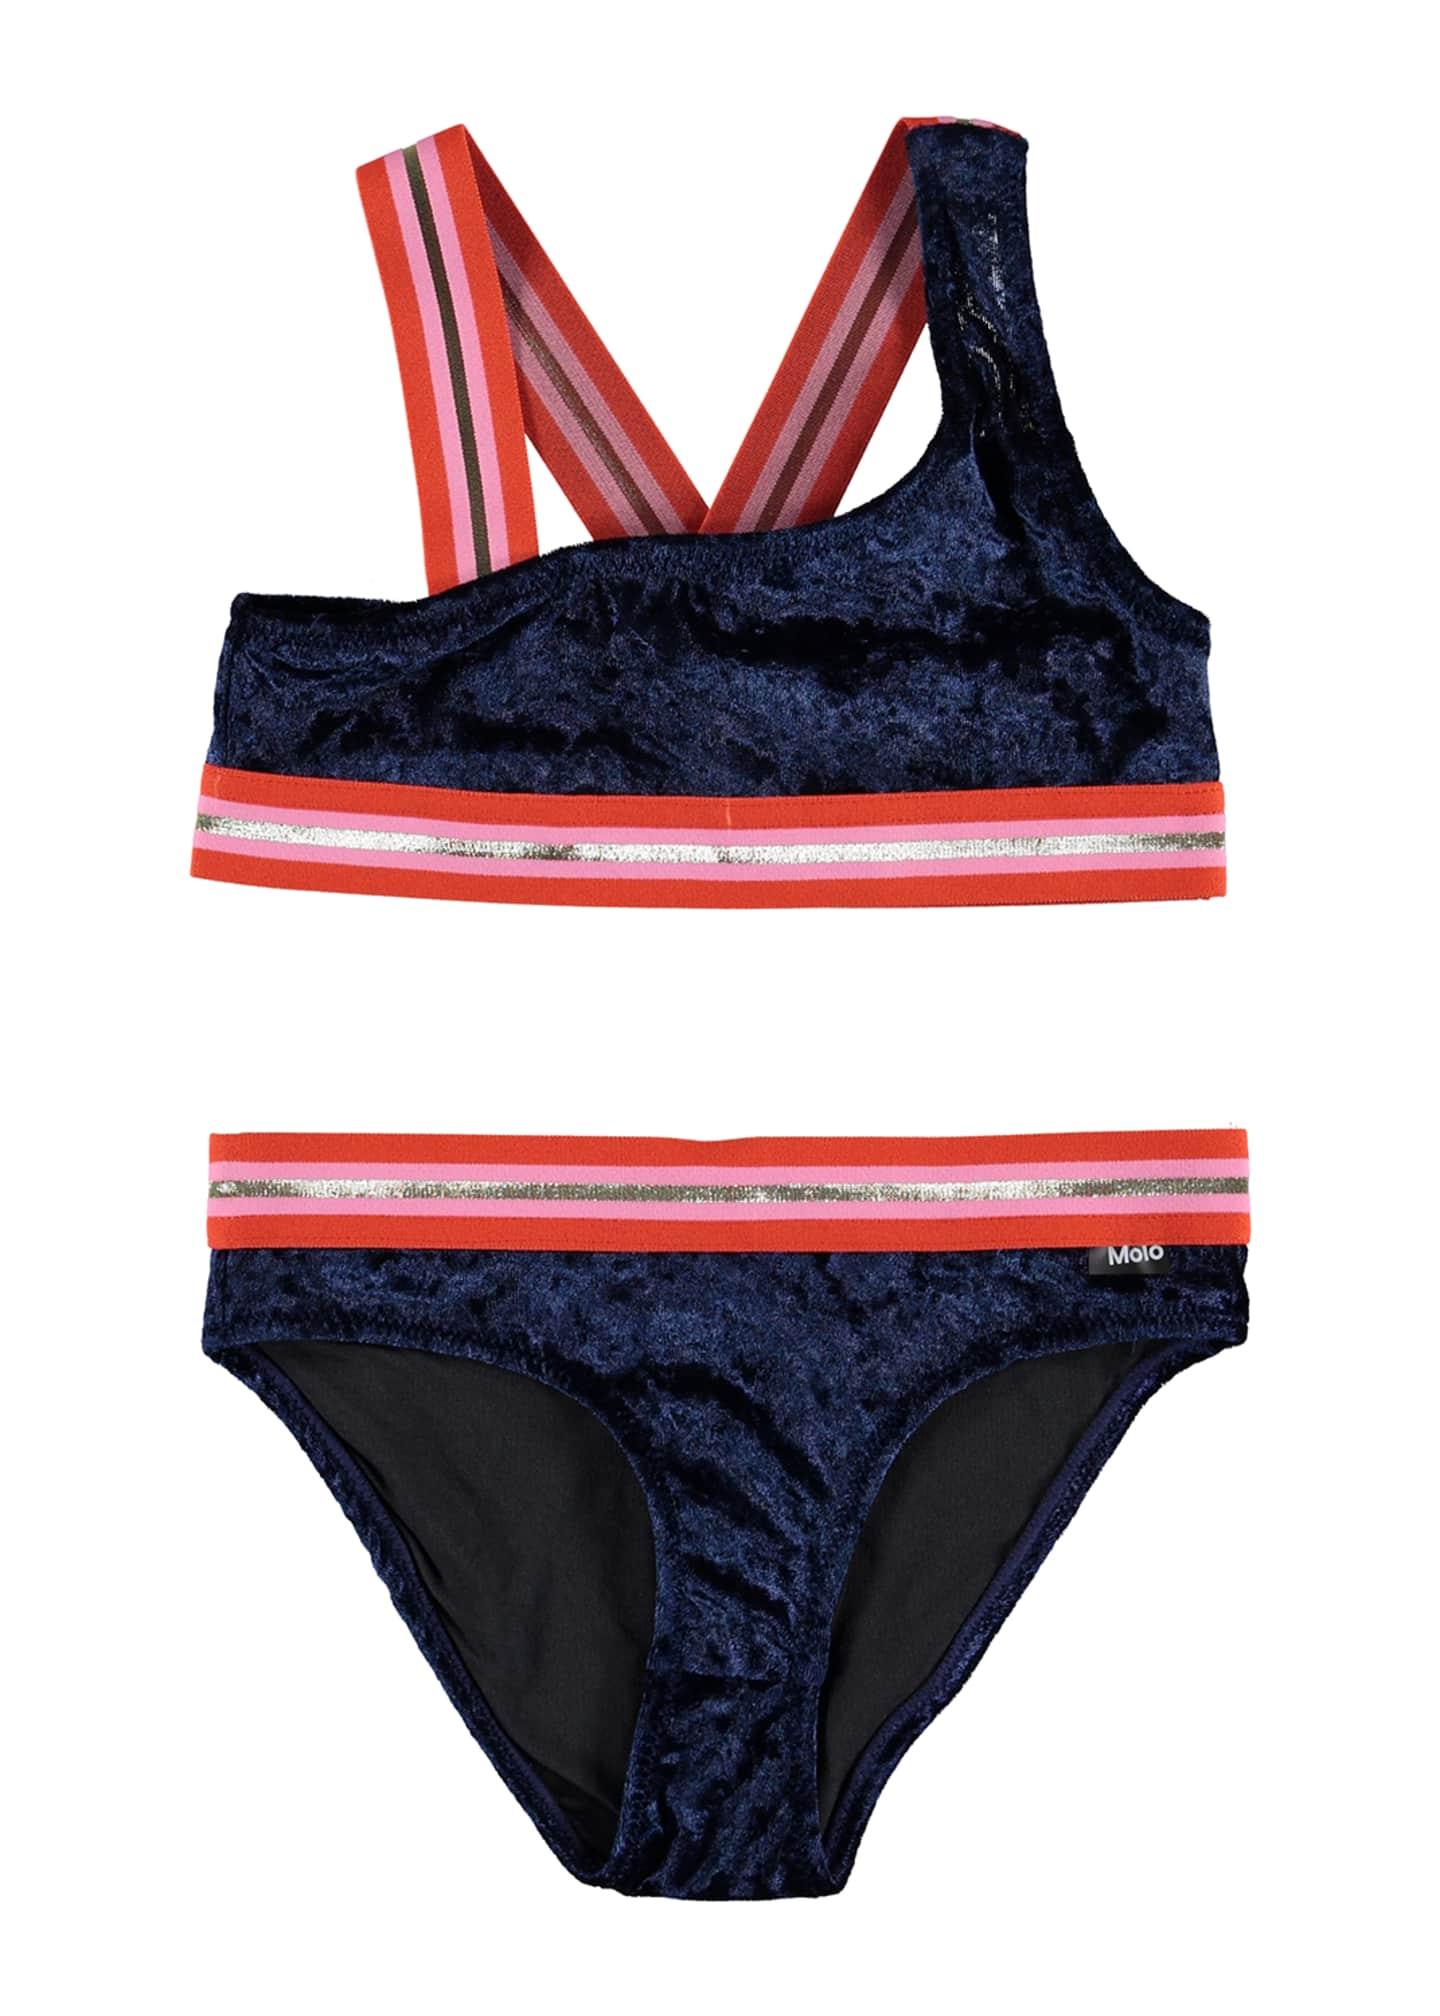 Molo Girl's Nicola Velvet Two-Piece Bikini w/ Sports